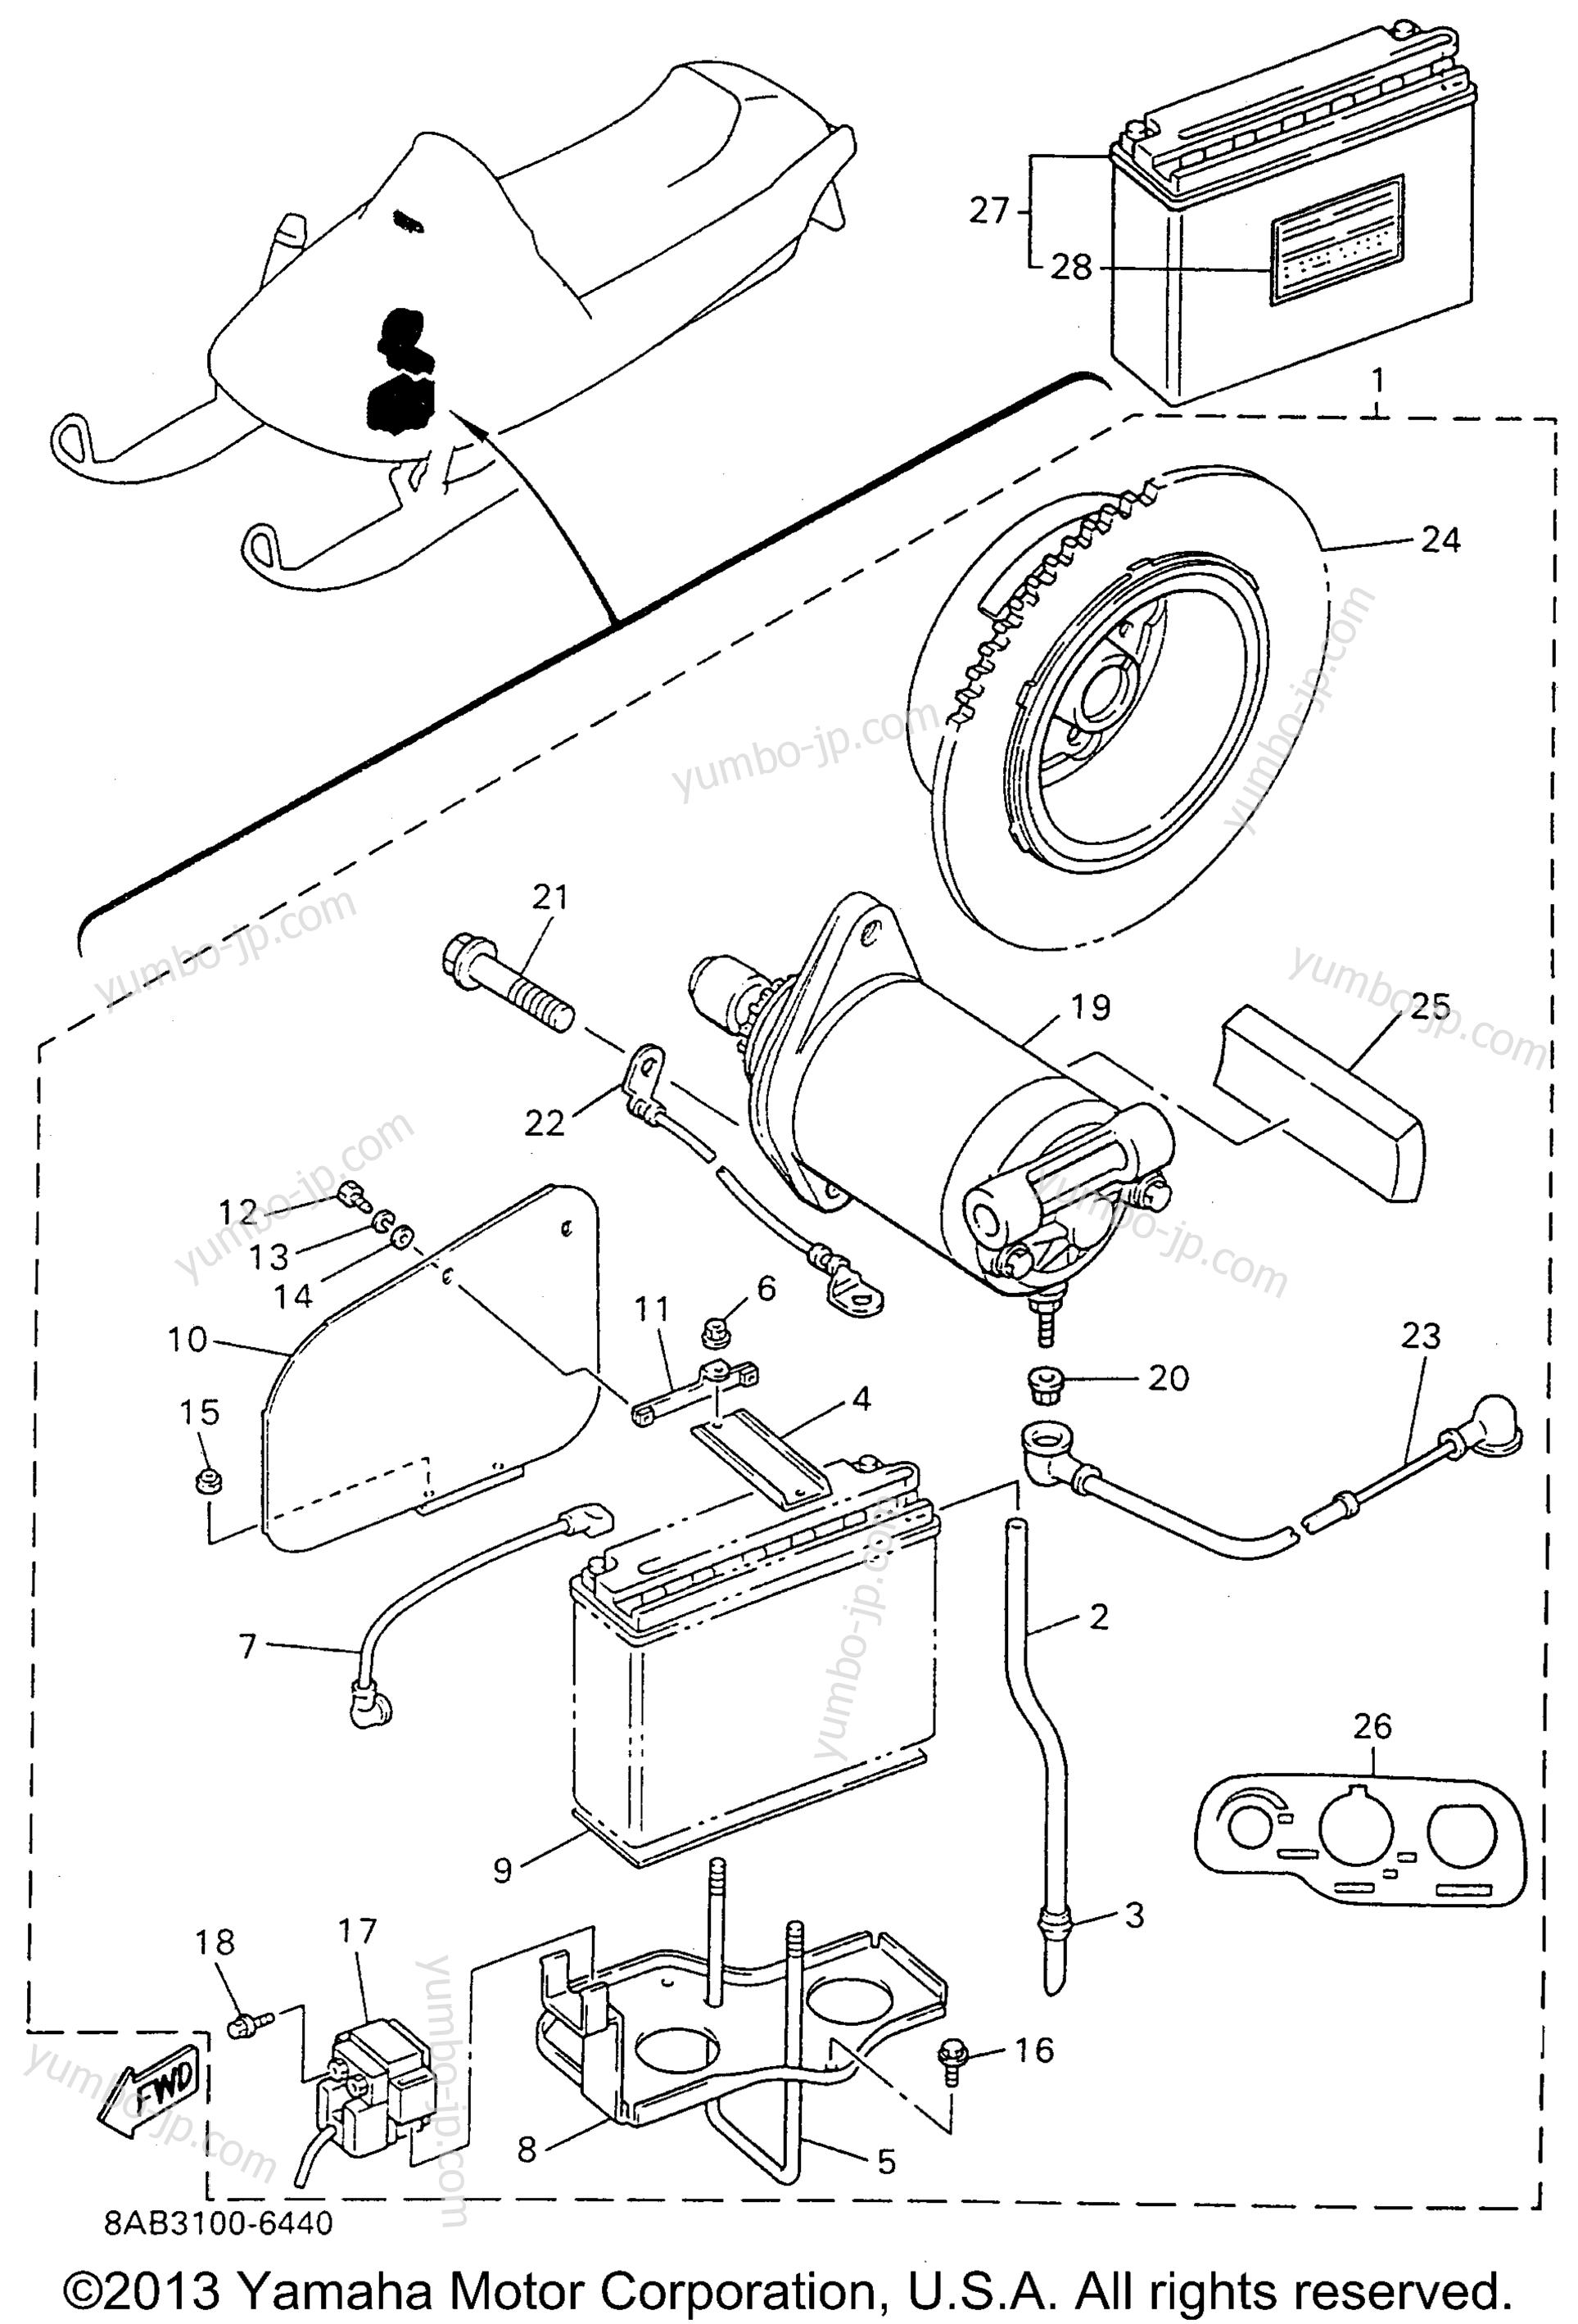 Alternate Starter Motor Kit Yamaha Vmax 600 Mountain Ignition Switch Wiring